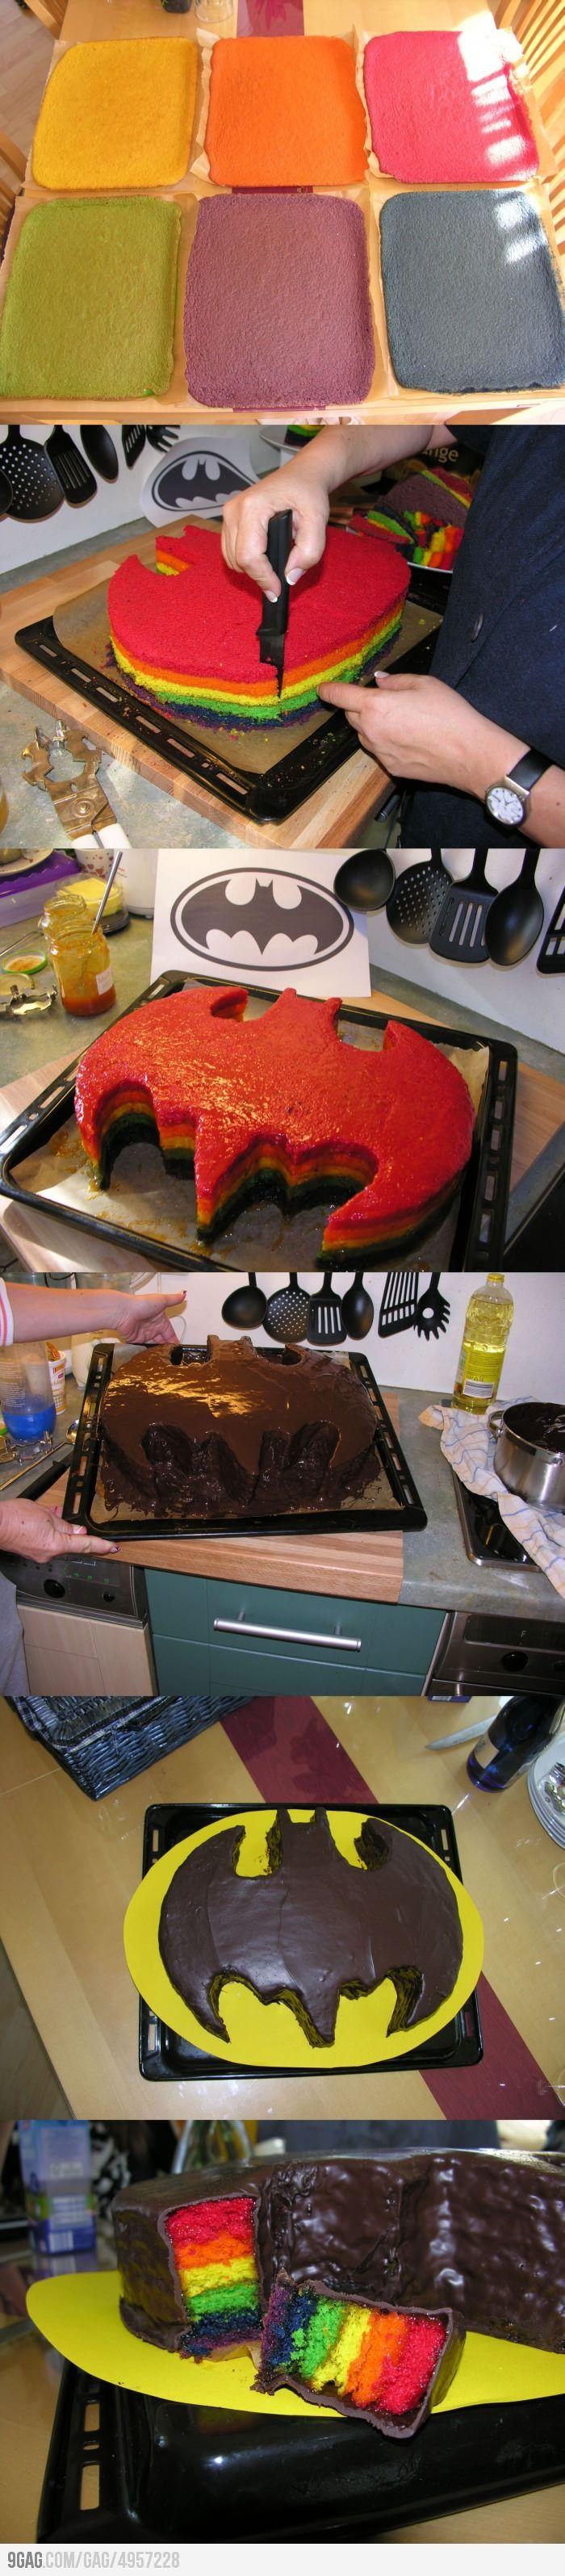 Batman cake for Zakk. @Mari Laine Carlson: Desserts, Layered Cakes, Idea, Awesome Cakes, Rainbows Cakes, My Birthday, Batman Cakes, Grooms Cakes, Birthday Cakes